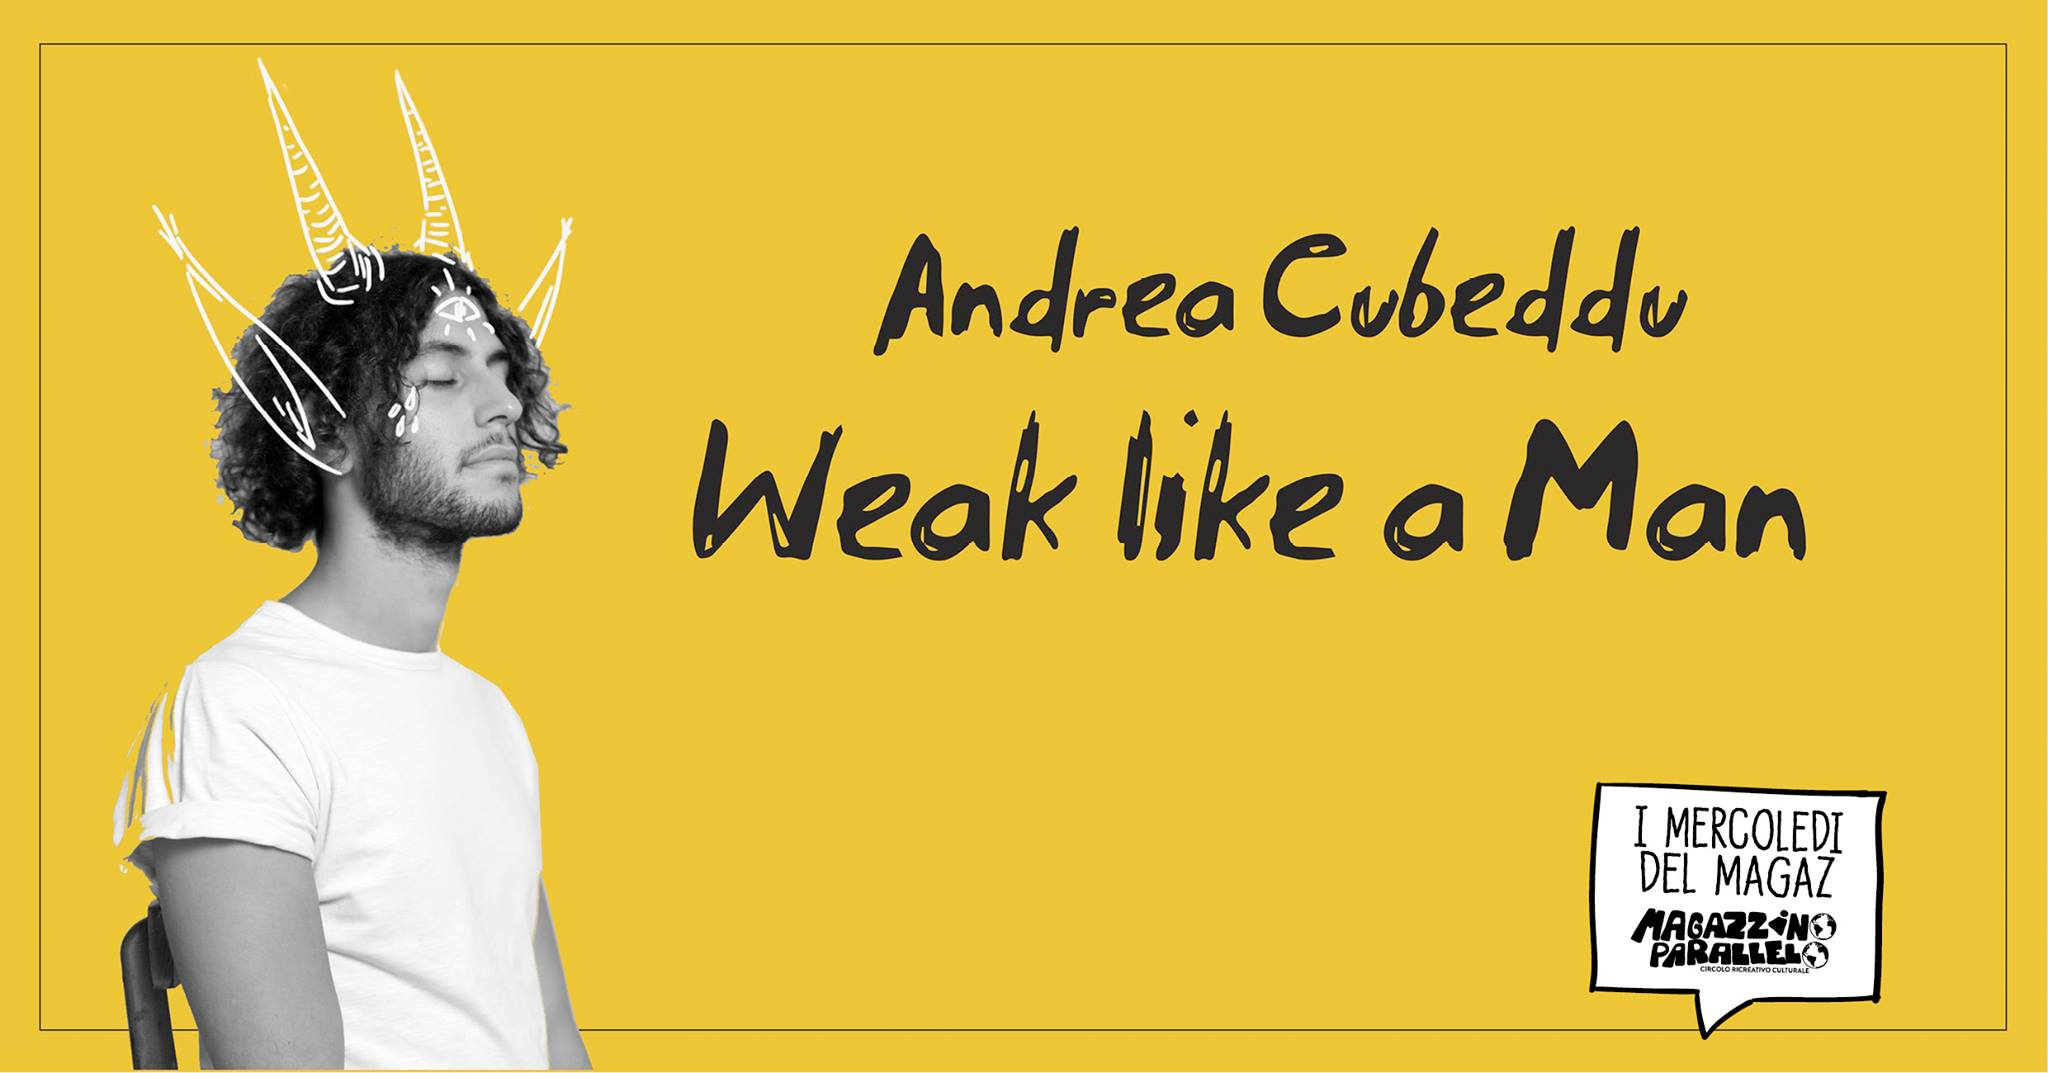 Andrea Cubeddu · Weak Like a Man / at Magazzino Parallelo